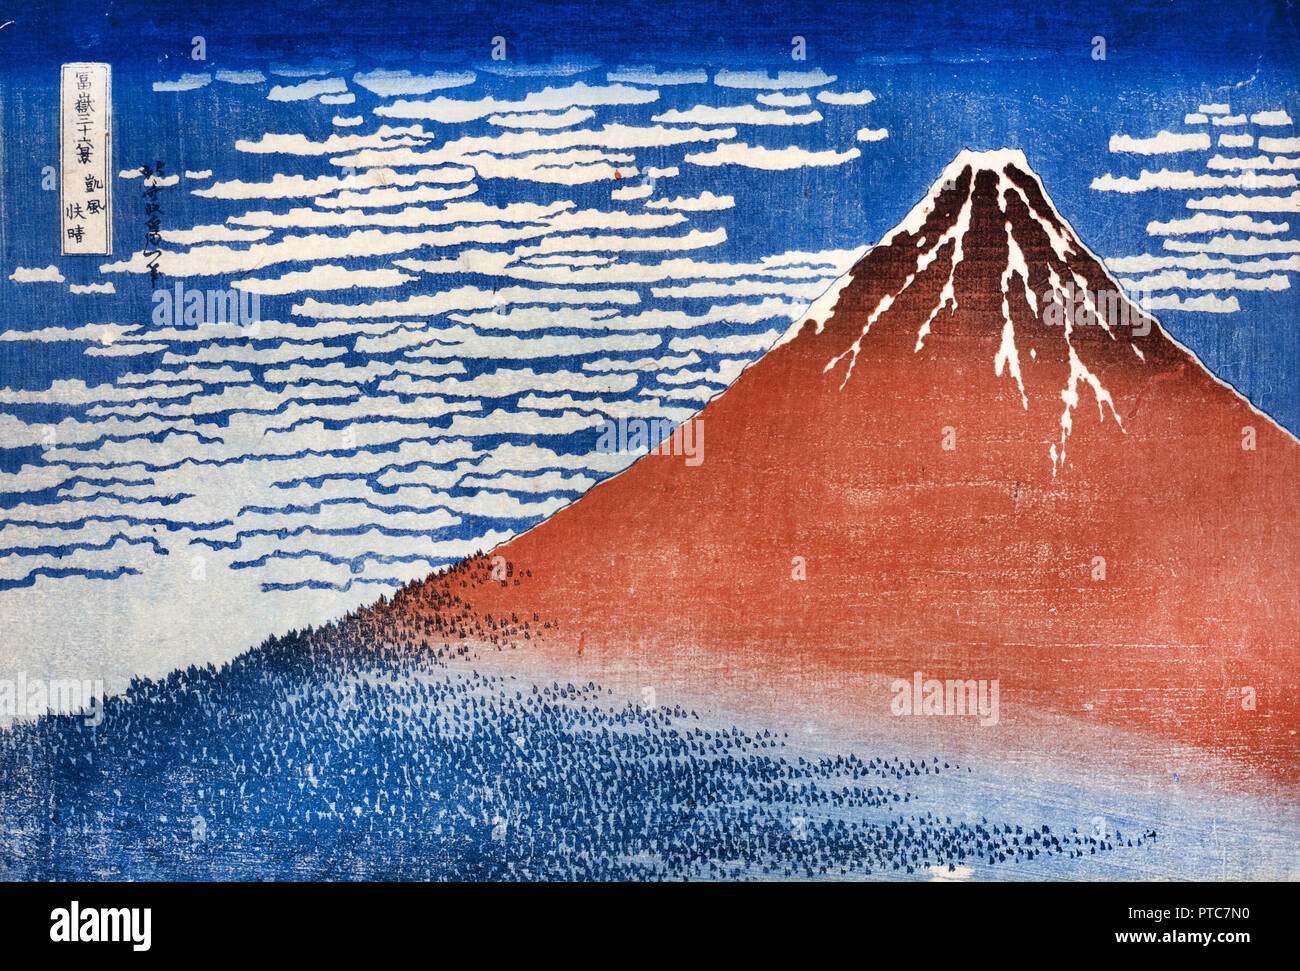 Katsushika Hokusai, feine Wind, klarer Morgen/Gaifu Kaisei, ca. 1800-1849, Farbe holzschnitt, Indianapolis Museum of Art, USA. Stockbild